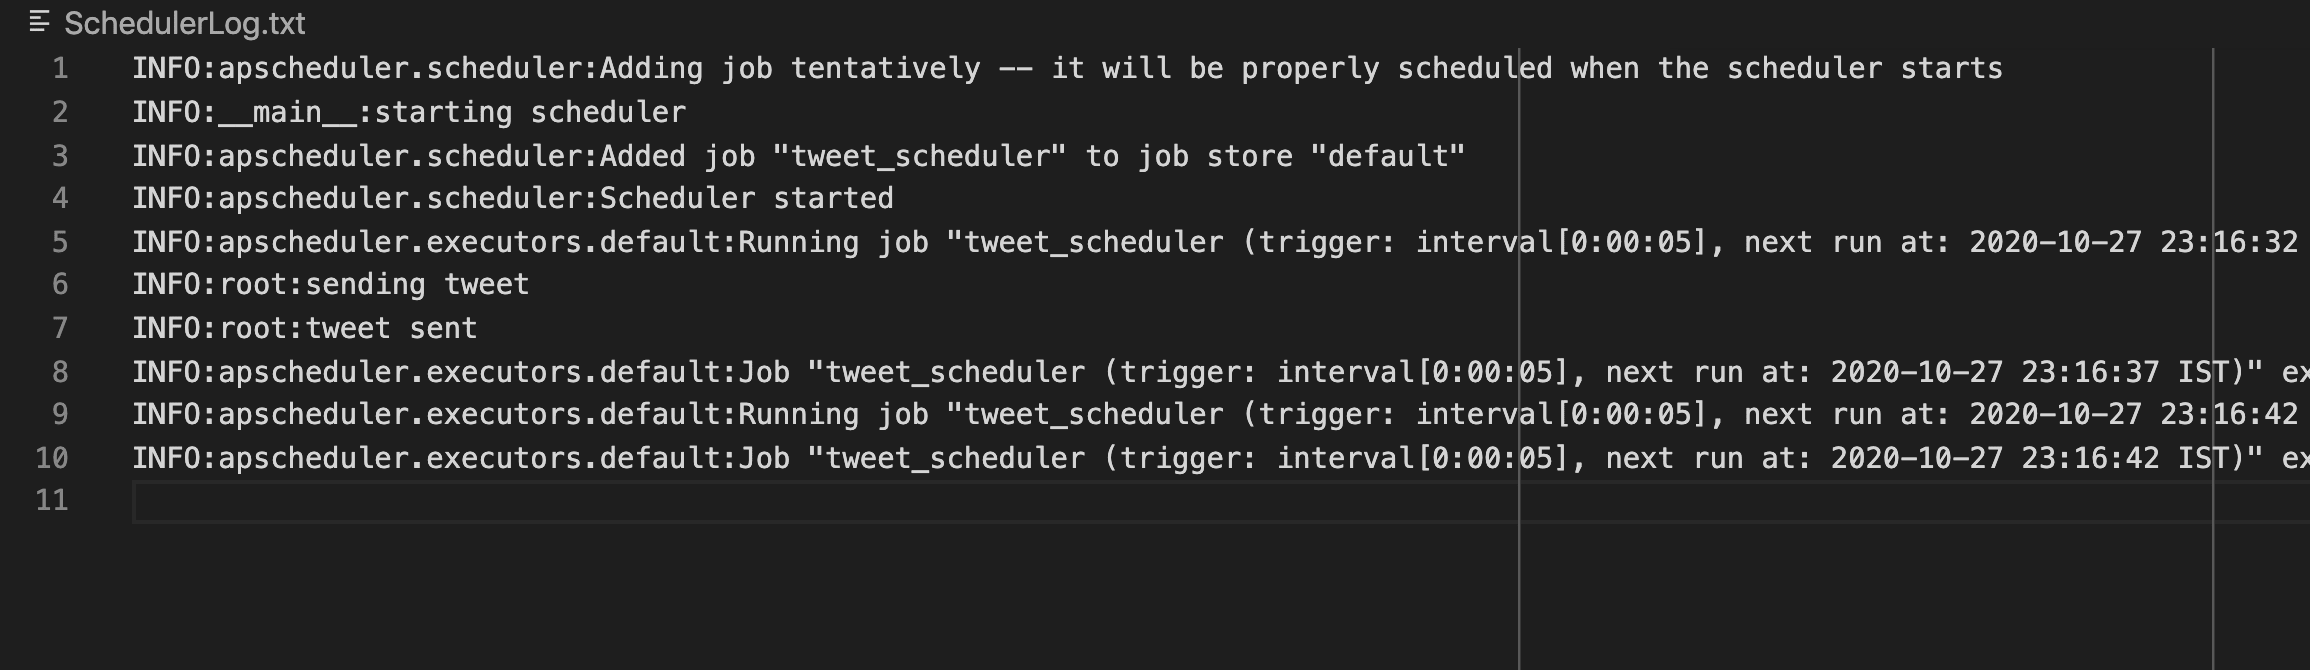 App scheduler logs